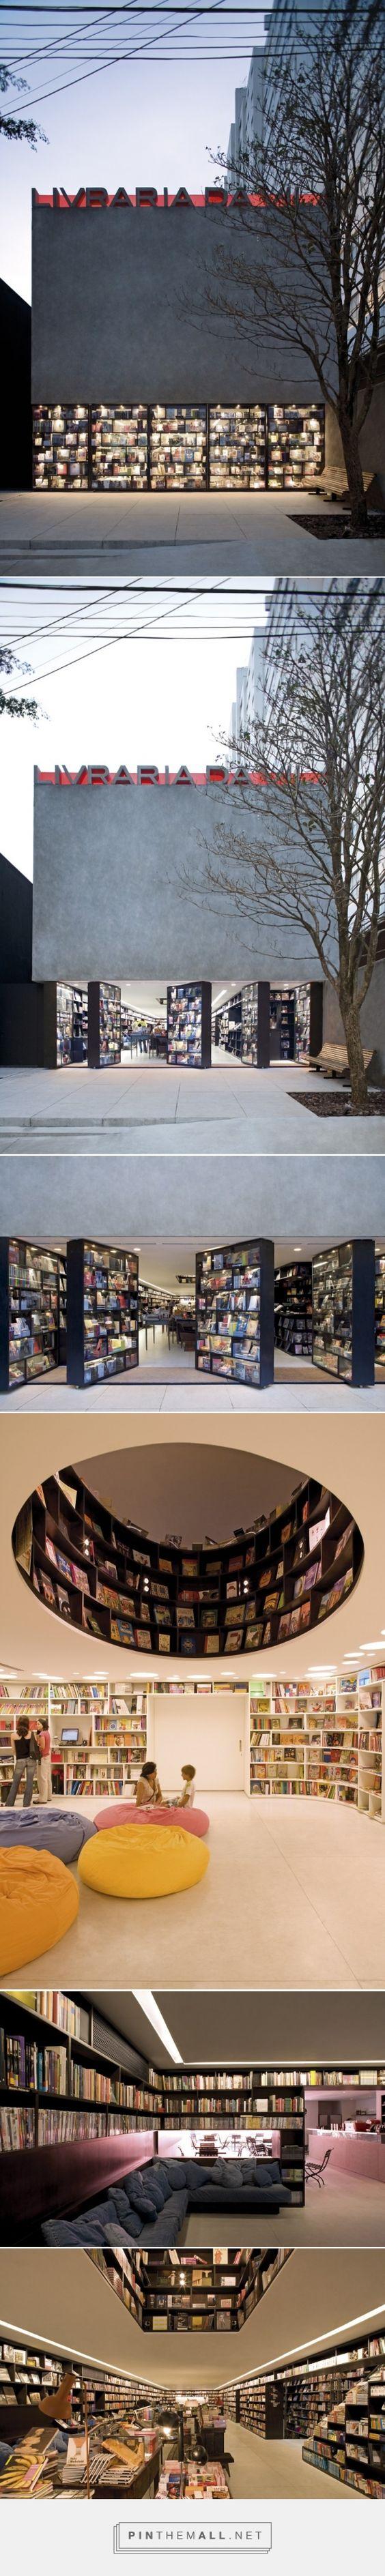 Livraria da Vila / Isay Weinfeld - created via http://pinthemall.net